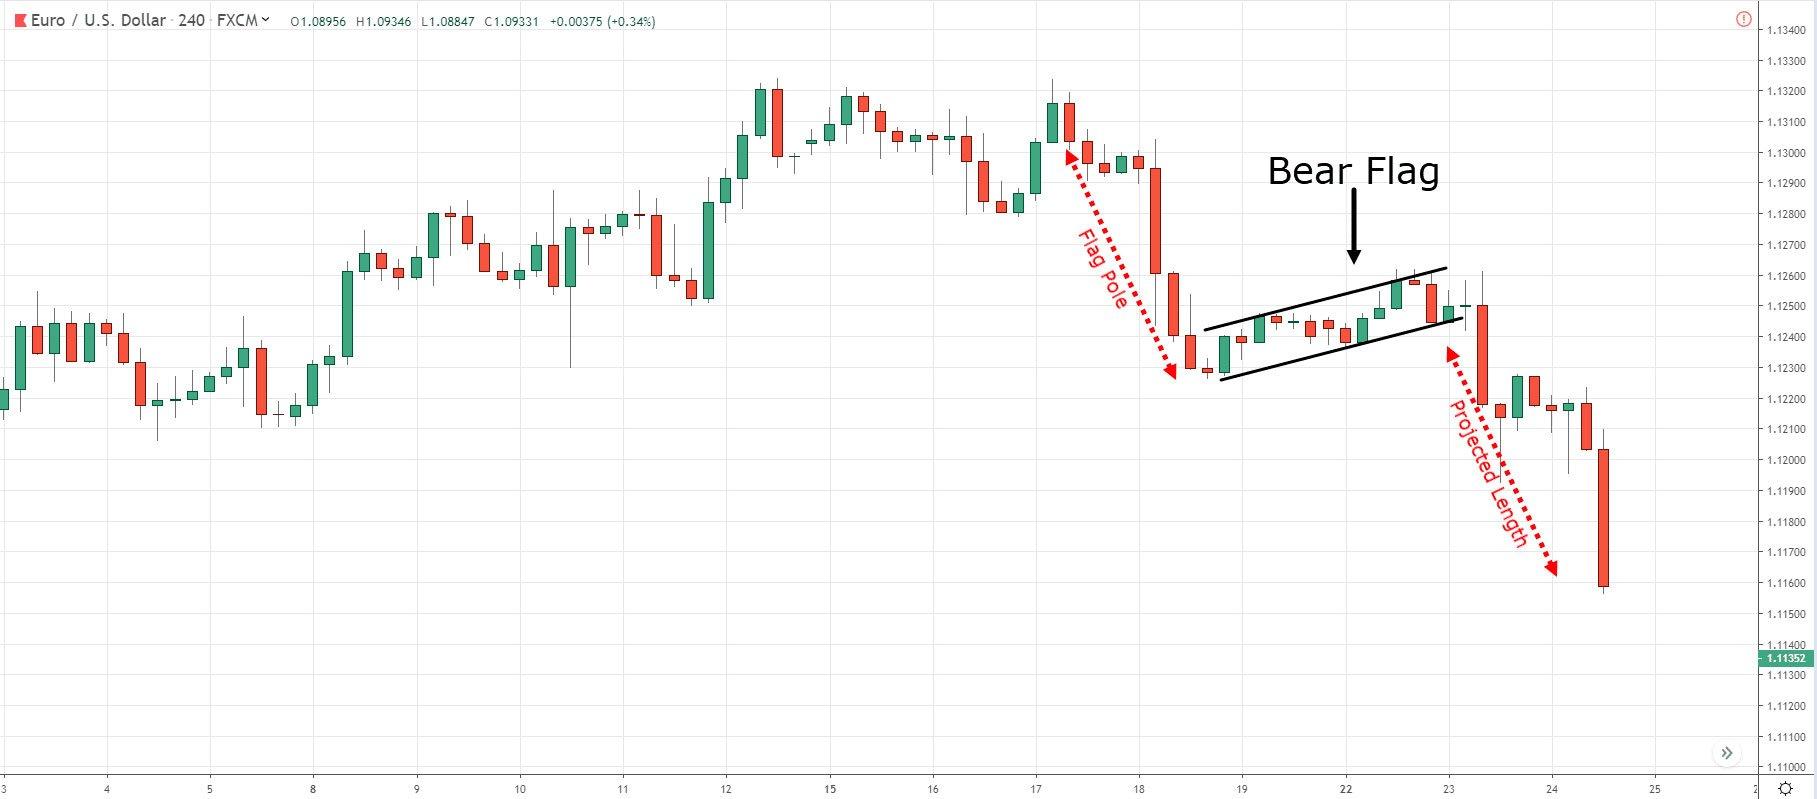 successful bear flag trading strategies